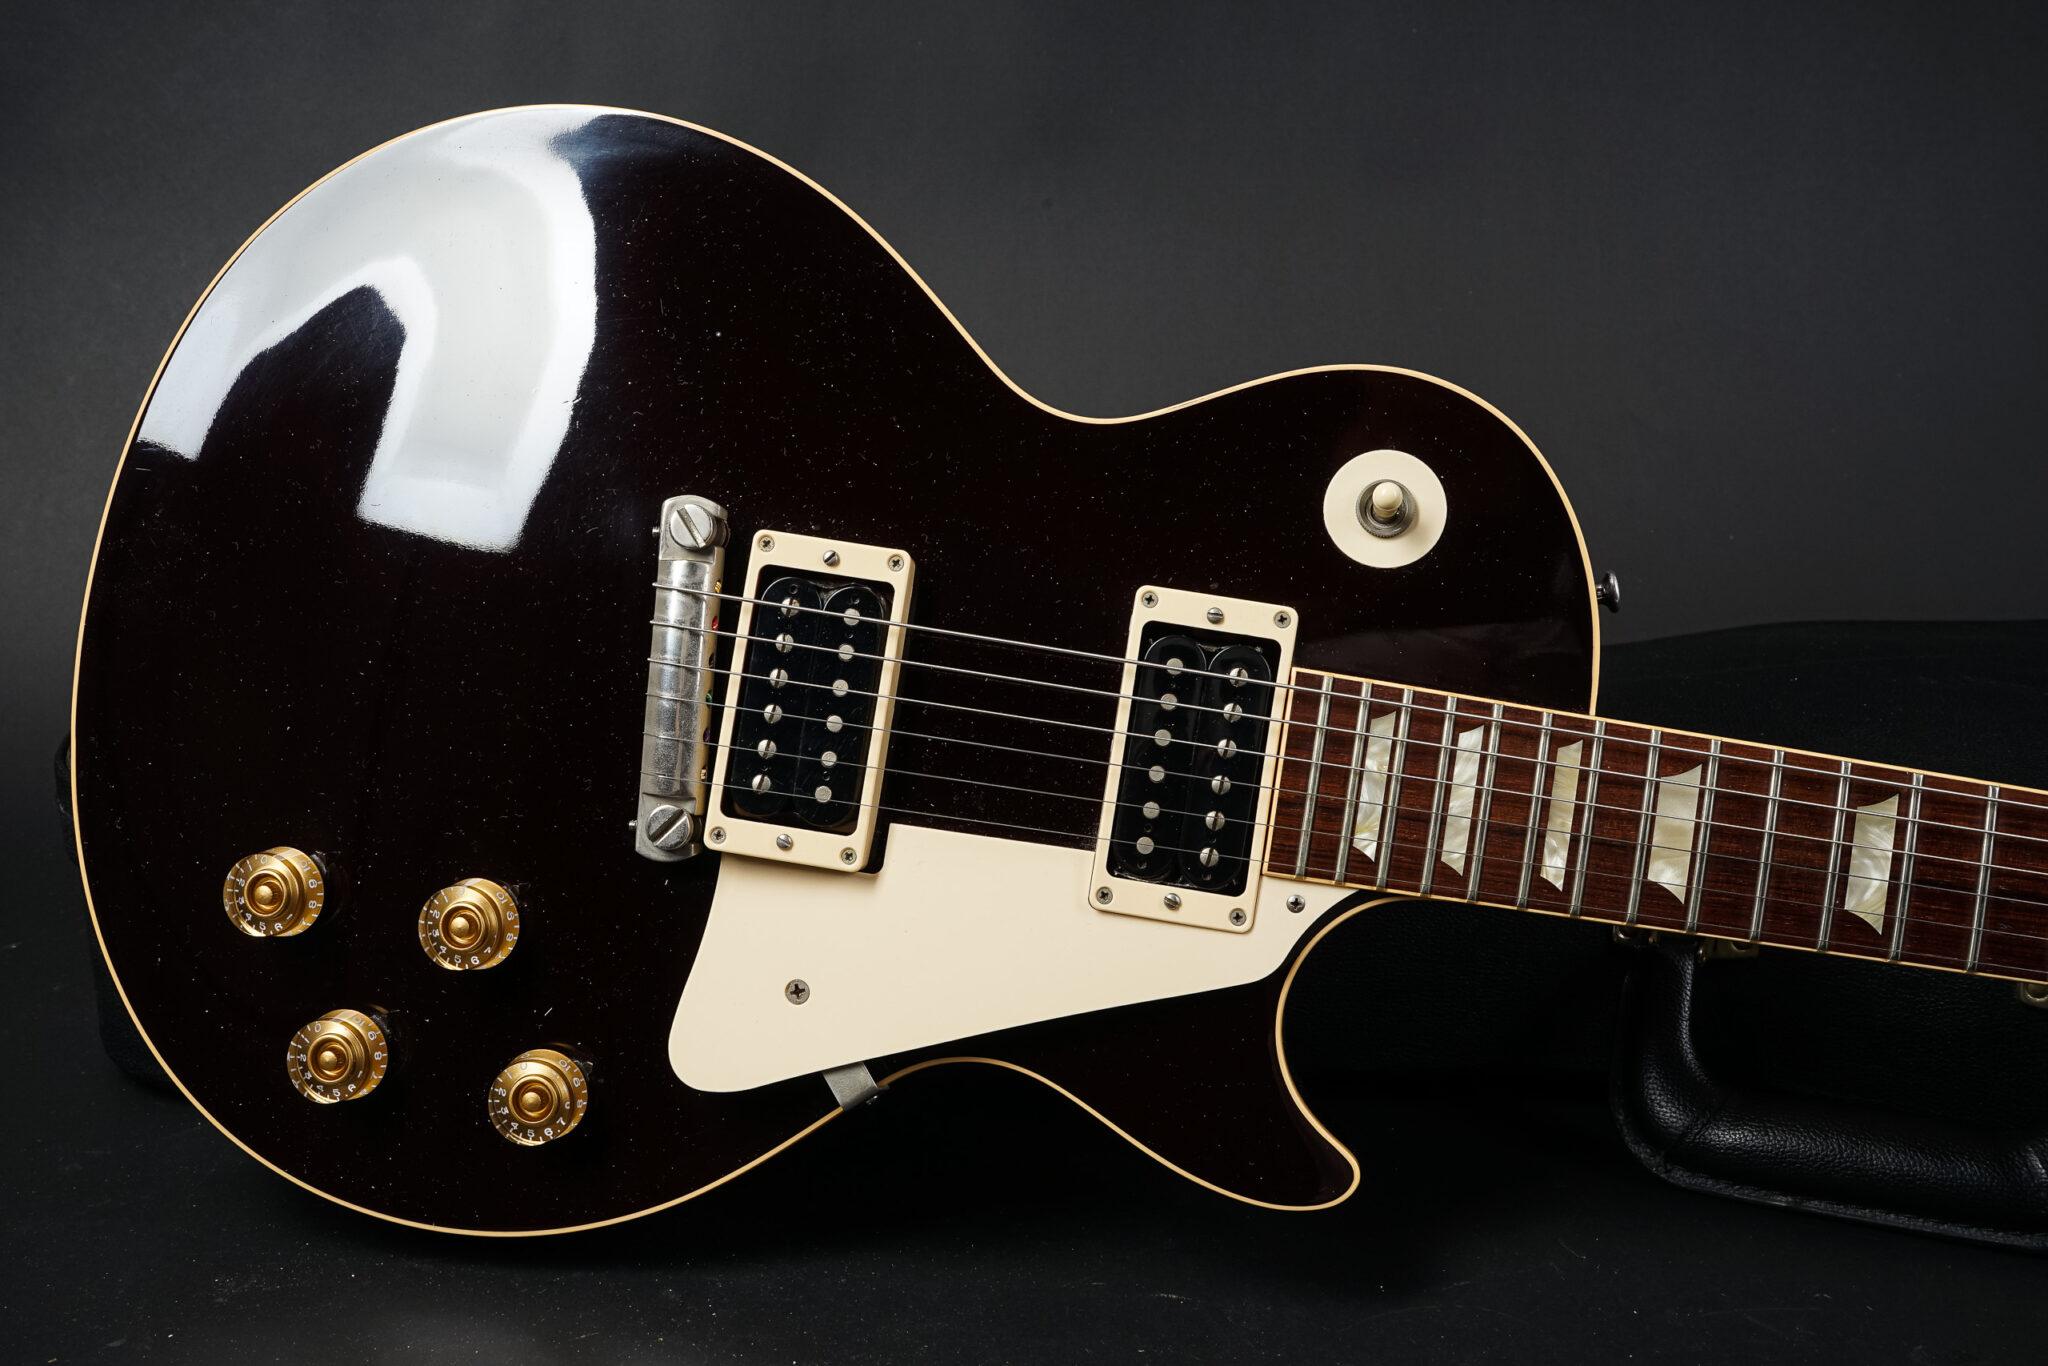 https://guitarpoint.de/app/uploads/products/2007-gibson-les-paul-1954-reissue-jeff-beck-oxblood/2007-Gibson-Les-Pauol-1954-JB-Oxblood-47102-6-2048x1366.jpg